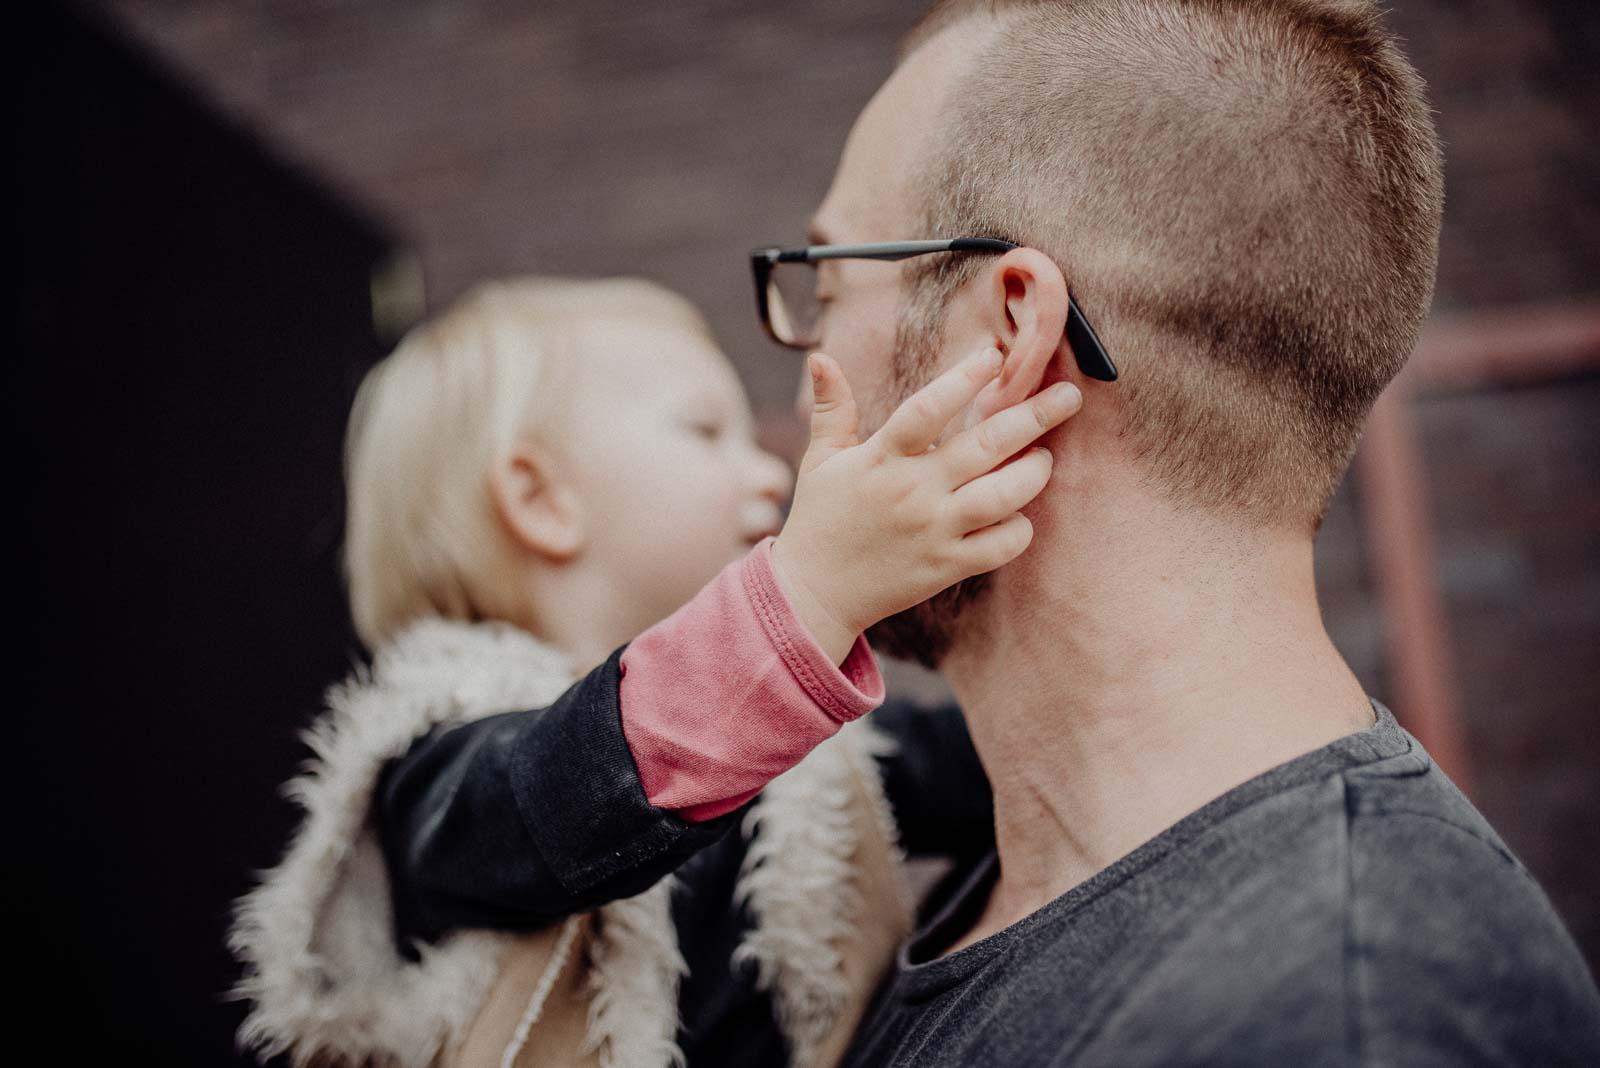 Ava kitzelt Papa hinterm Ohr